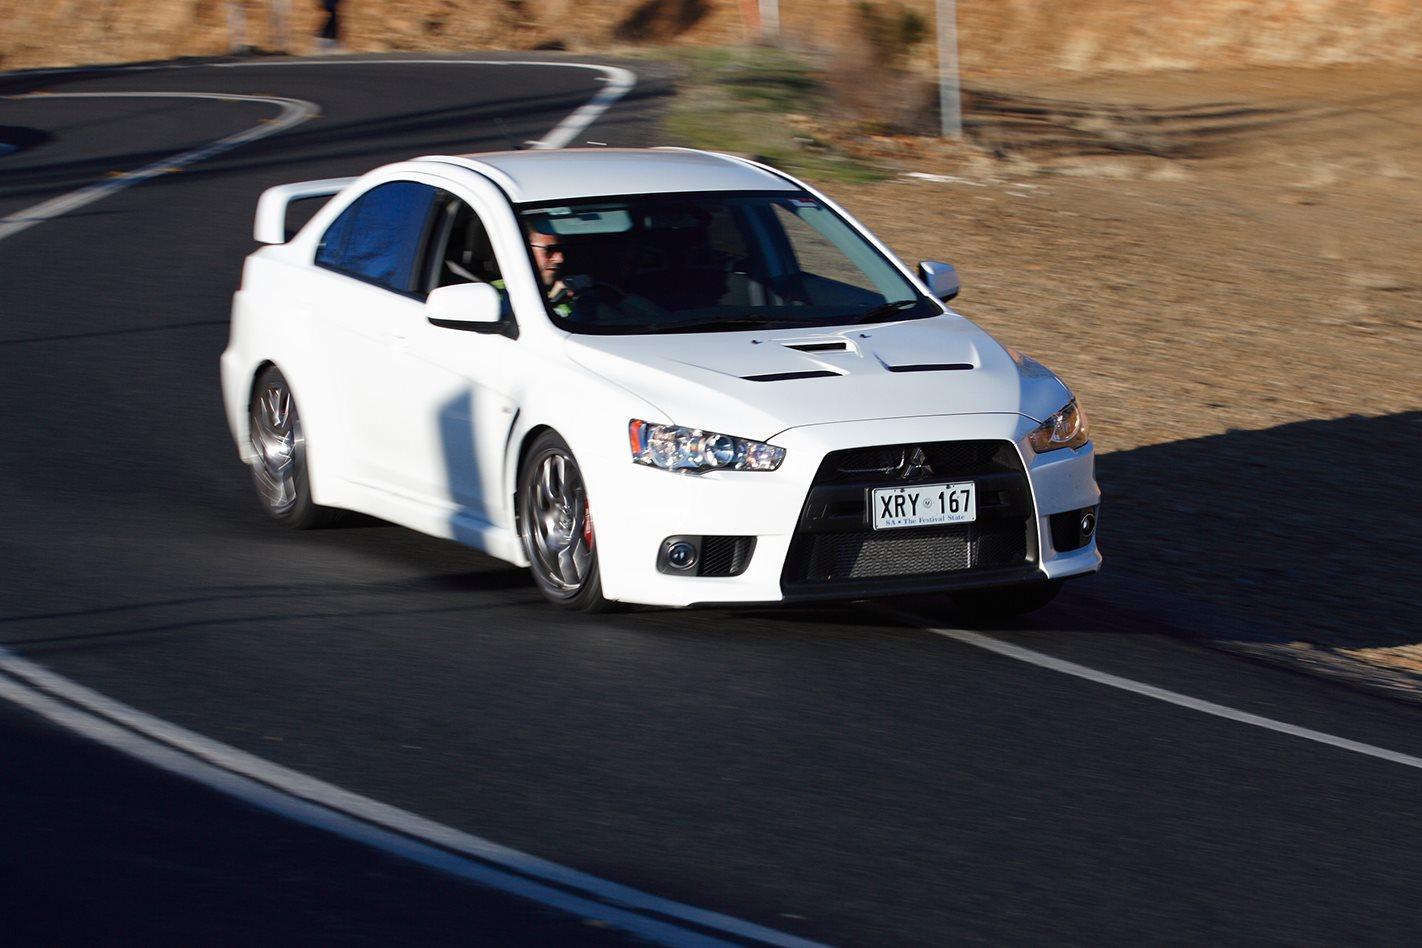 2008-Mitsubishi-Lancer-Evo-X-on-the-road.jpg